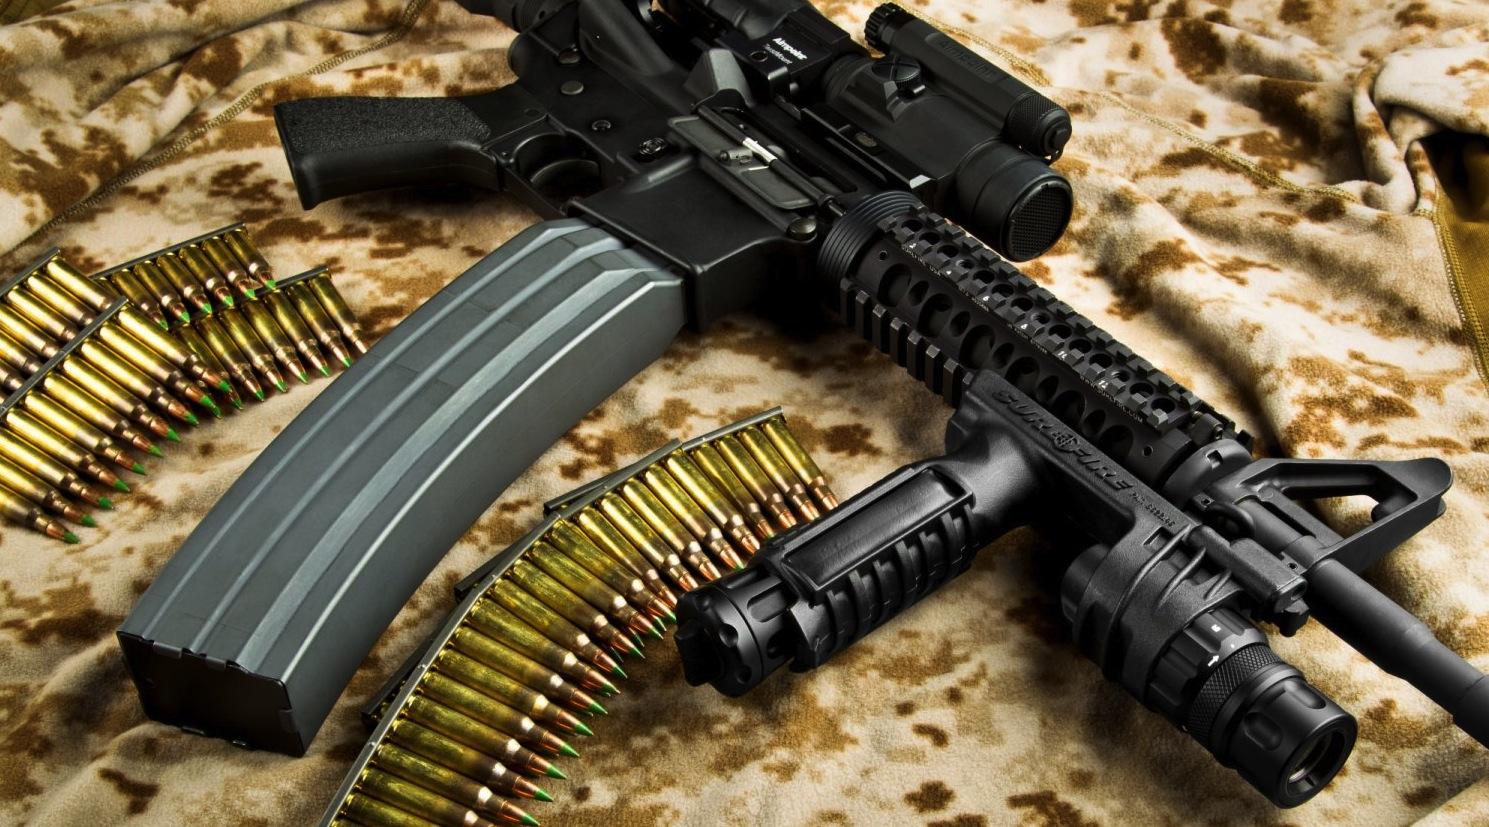 Atomiktiger 9 Useless And Unconstitutional Anti Gun Laws